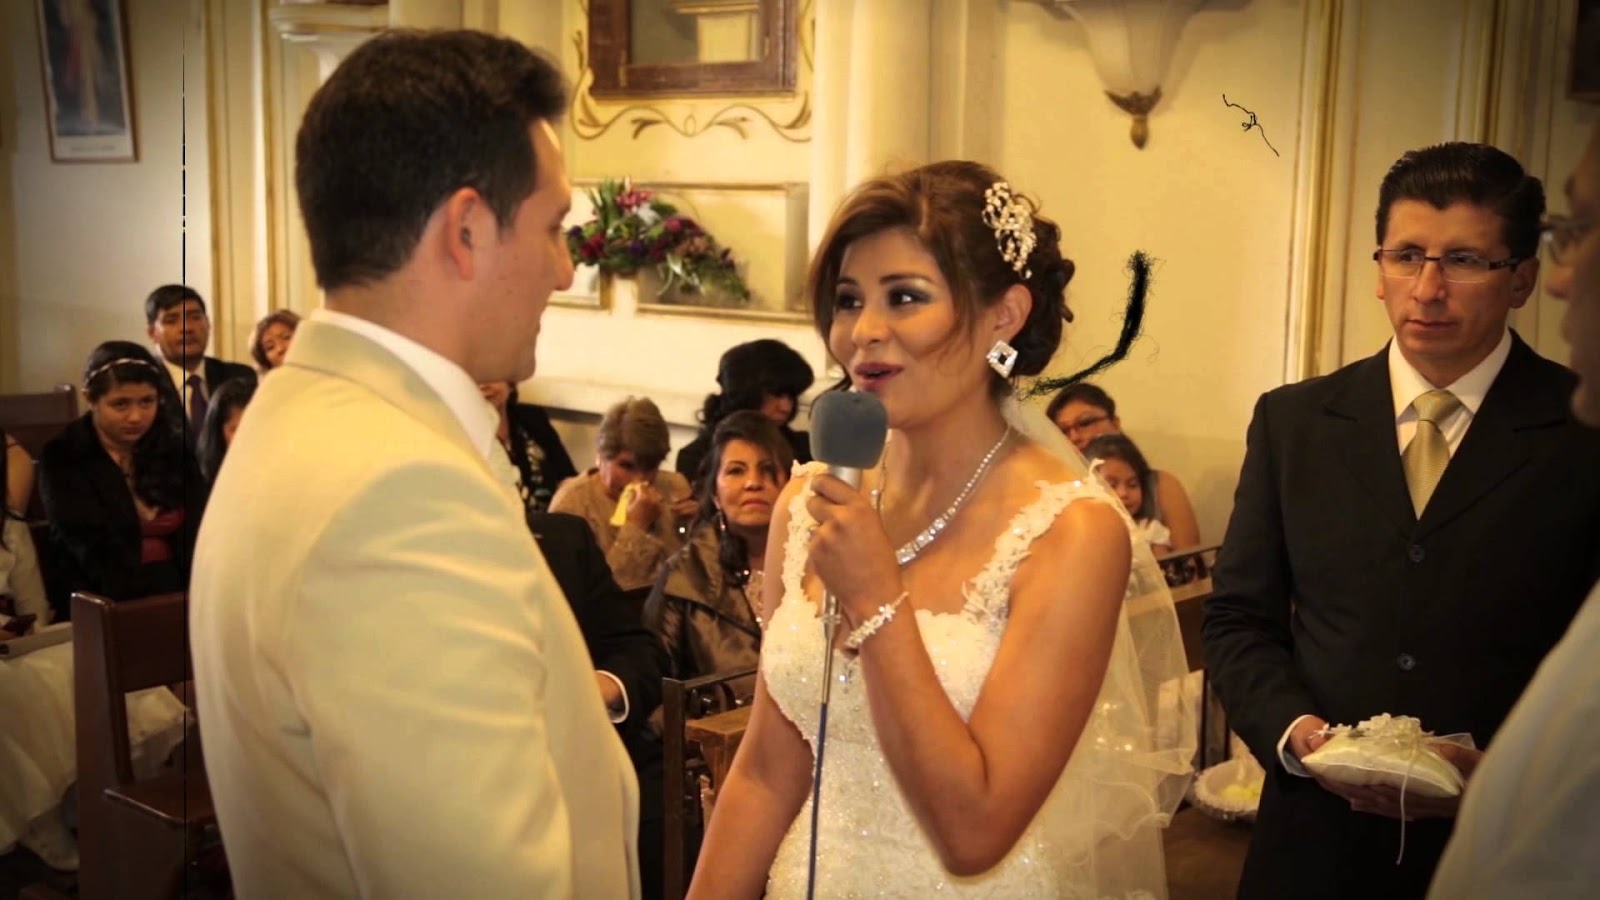 Matrimonio Civil O Religioso Biblia : El matrimonio en bolivia unandes